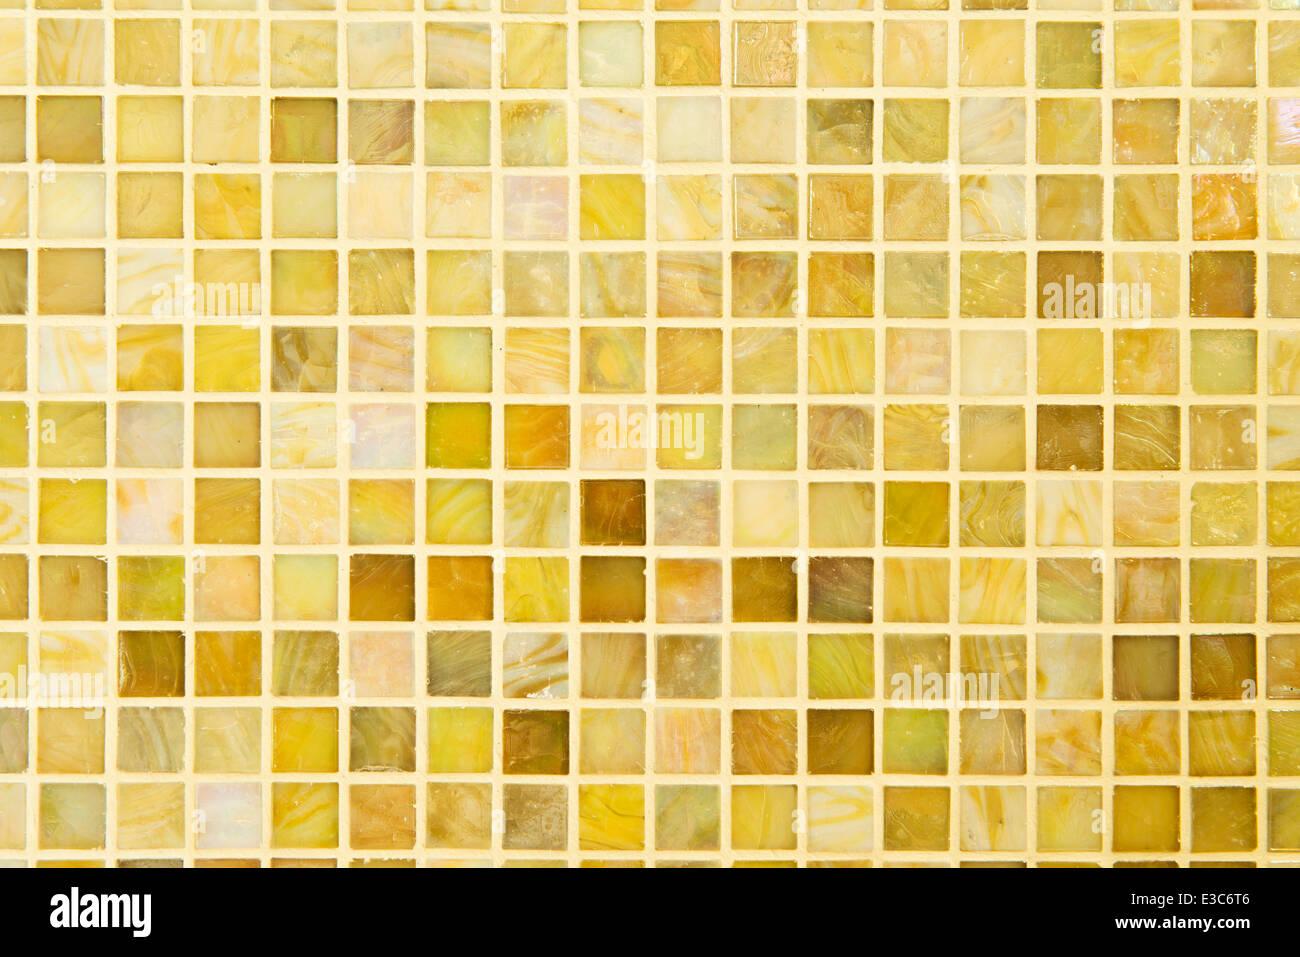 Textur: Schöne Gelbe Modernes Mosaik Fliesen An Wand.